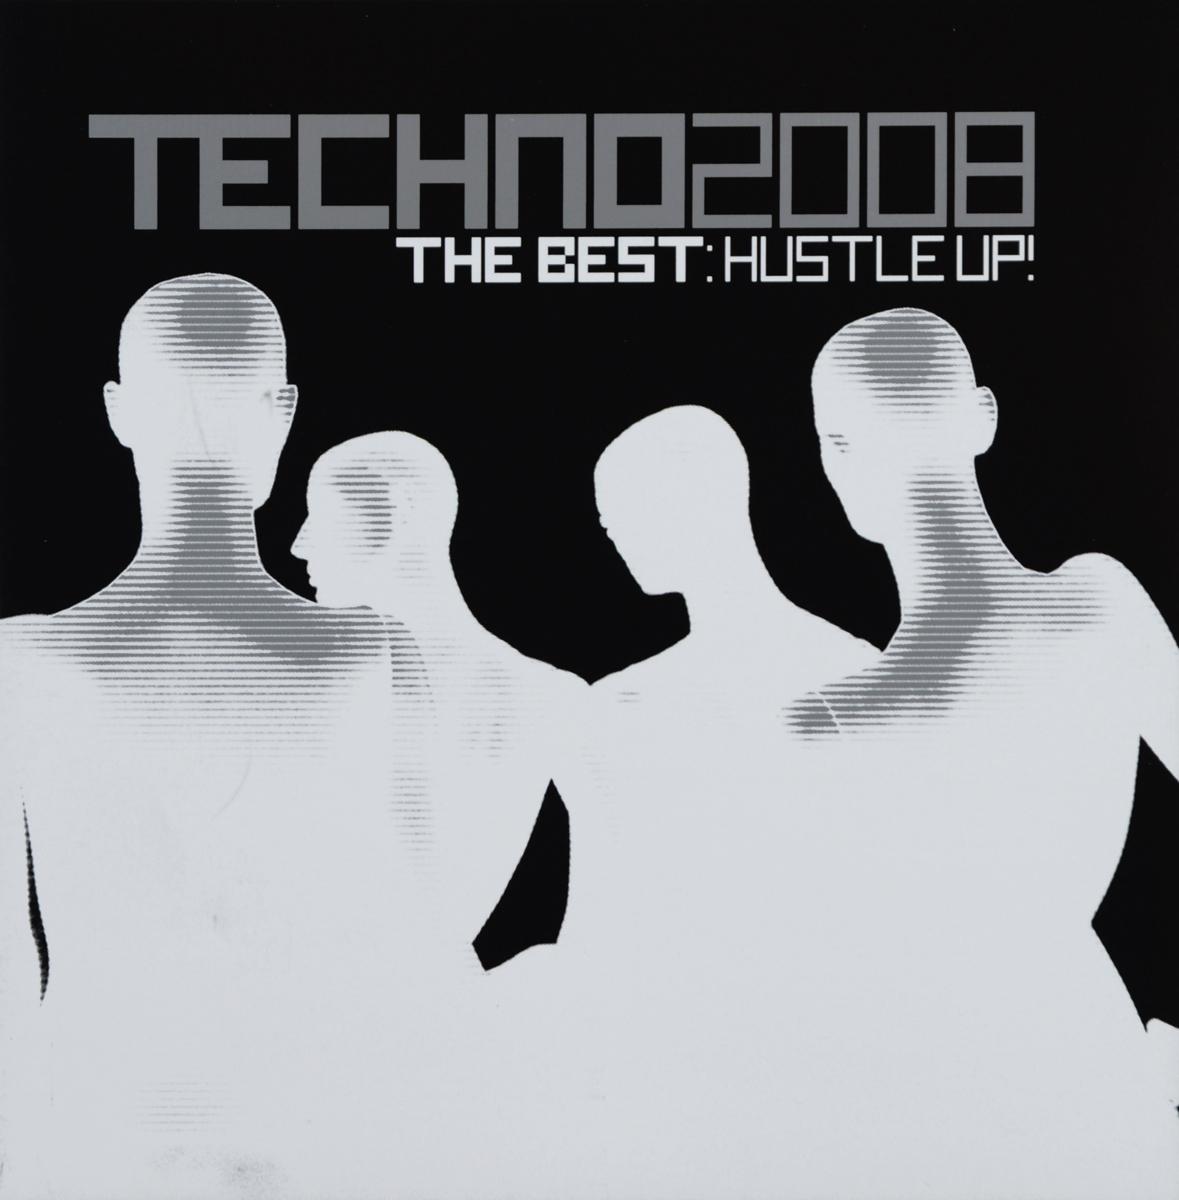 Techno 2008. The Best. Hustle Up! (2 CD) 2 Audio CD